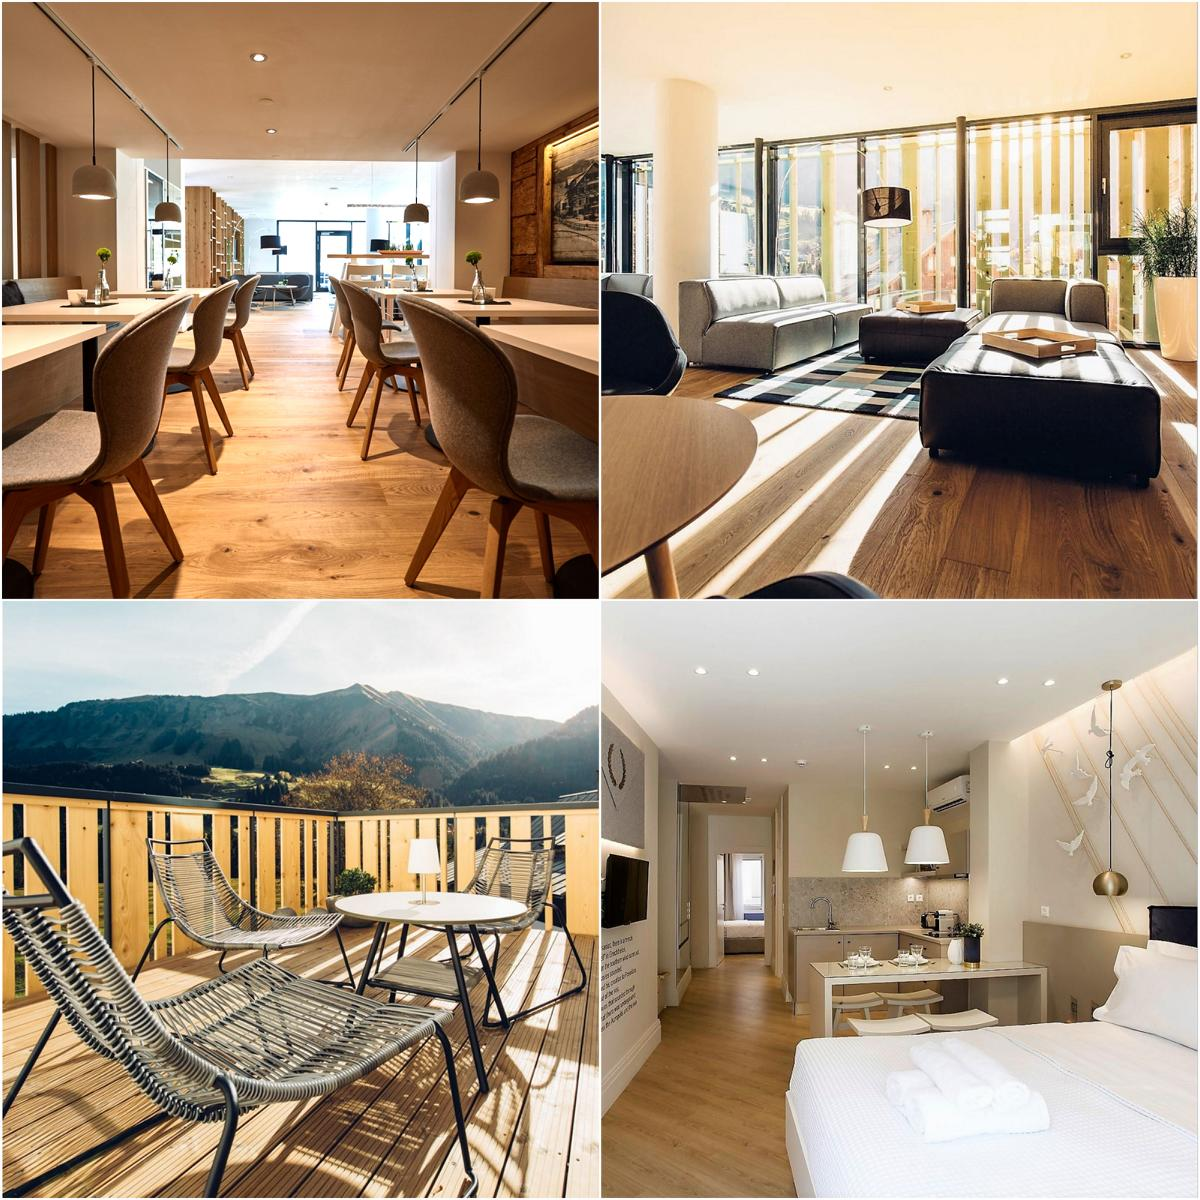 boconcept experience hotel sonnenburg riezlern austria 1 - Business + Objekt